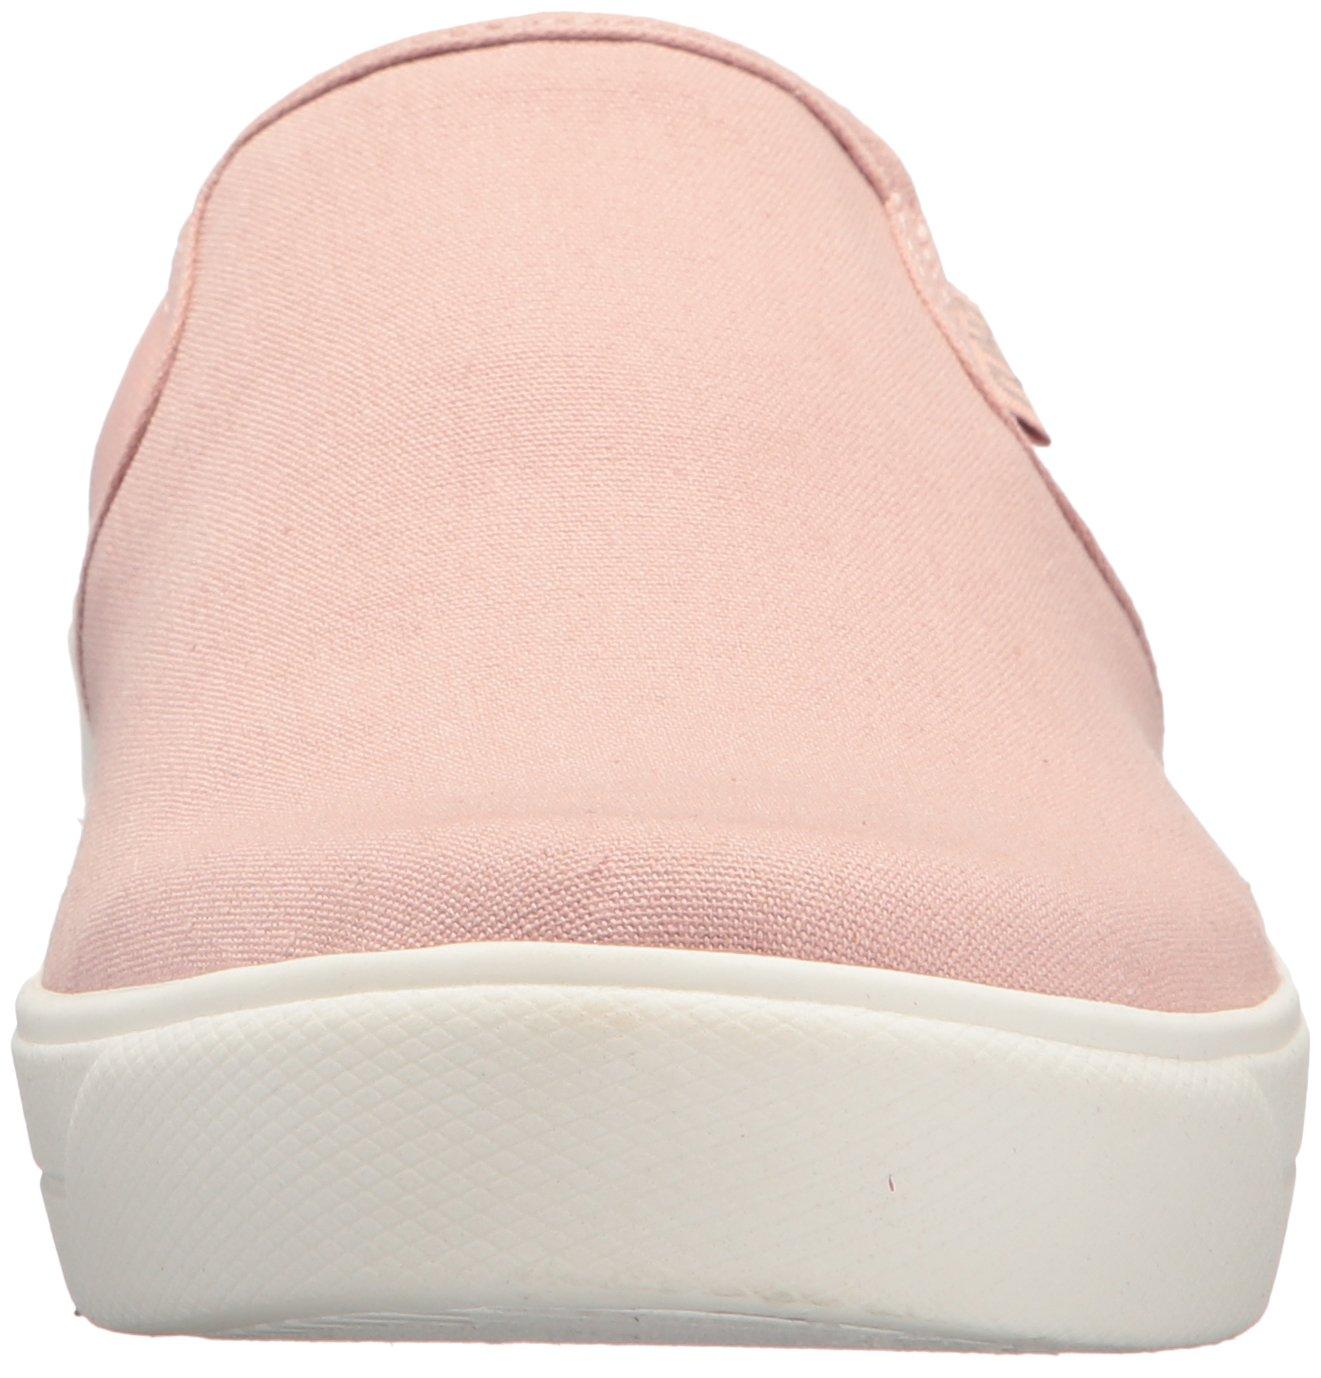 Ryka Women's Valerie Mule B07577XRZ5 Pink/White 11 W US|Poetic Pink/White B07577XRZ5 c5e781